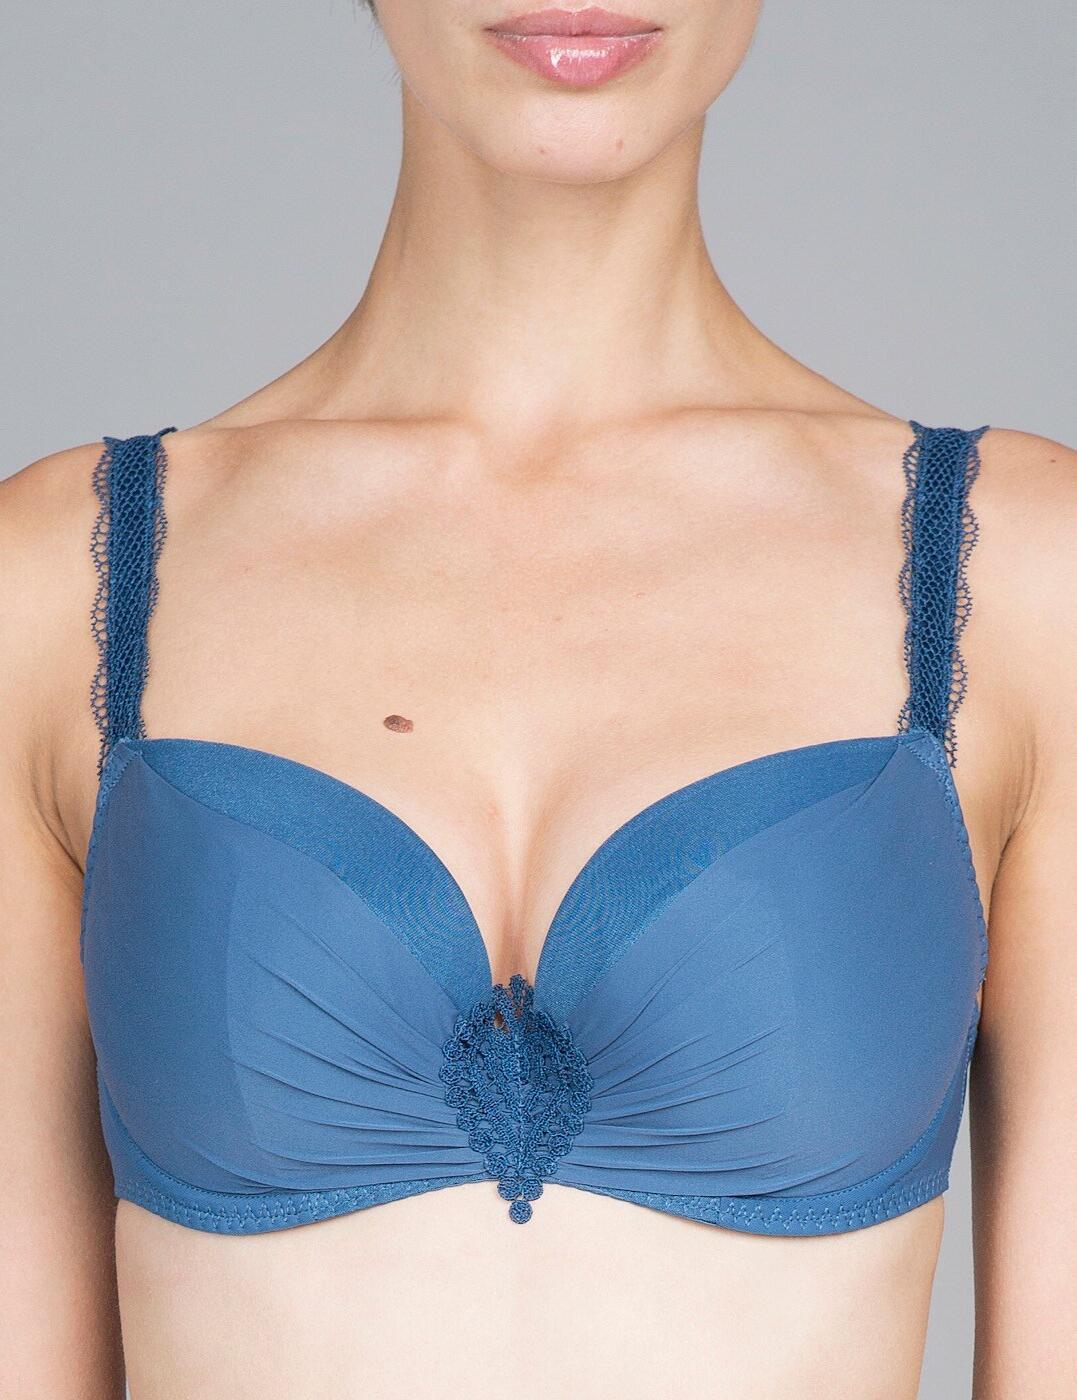 G61432 Maison Lejaby Attrape-Coeur 3 Part Padded Balconette Bra - G61432 Saphir Bleu